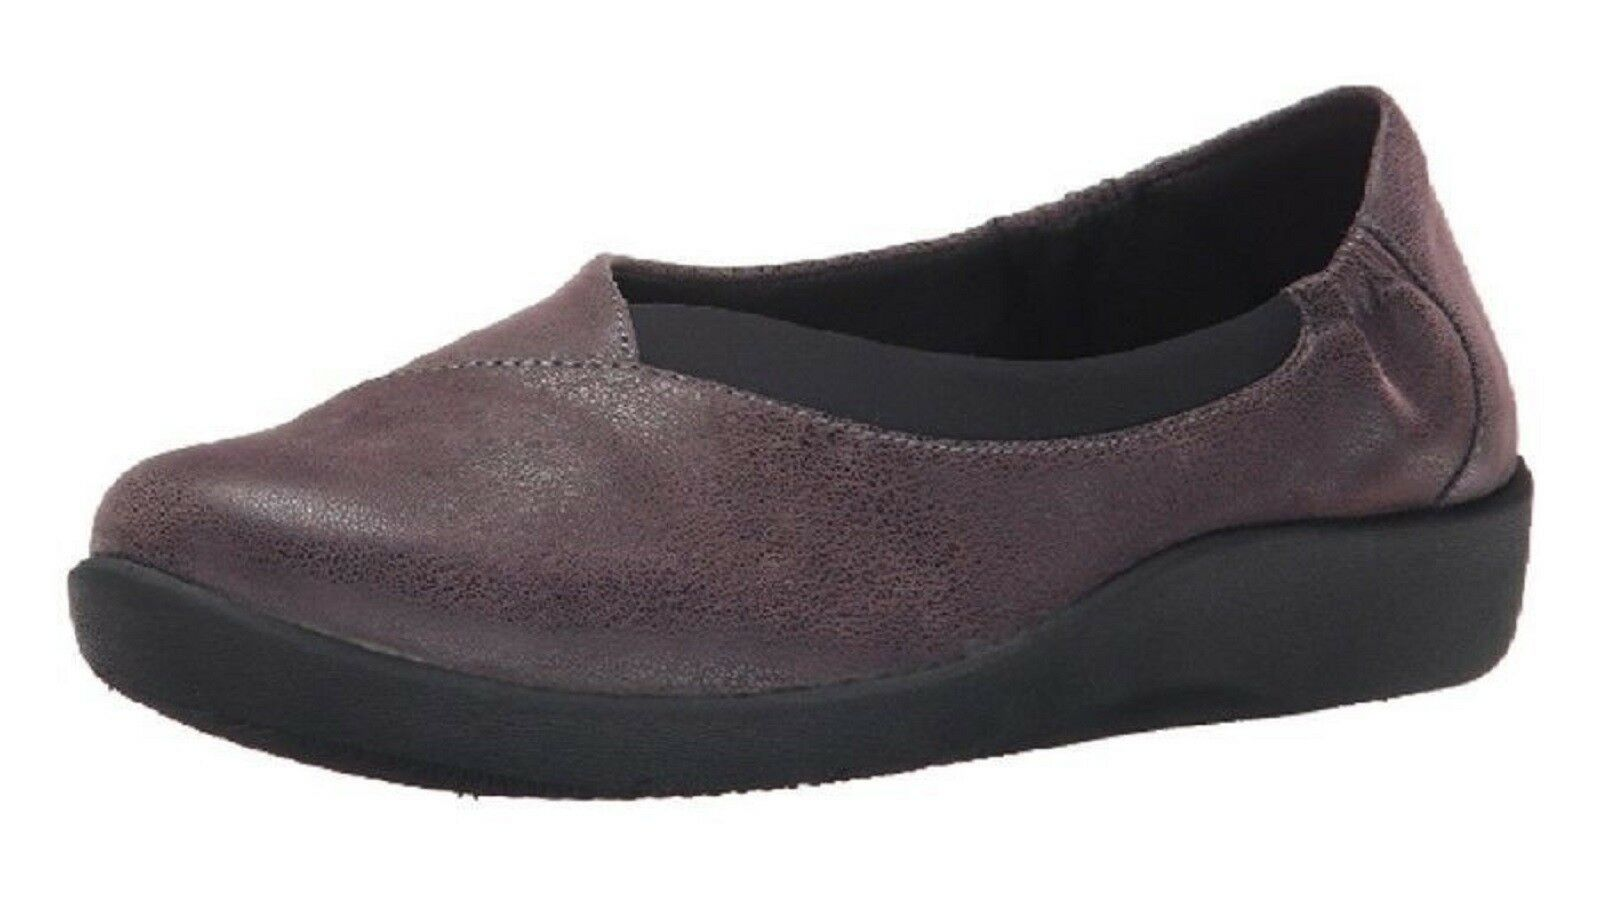 CLARKS Ladies SILLIAN JETAY Heathered Fabric Slip-On shoes shoes shoes PURPLE  Sz. 6.5 M NIB 0c3f5a